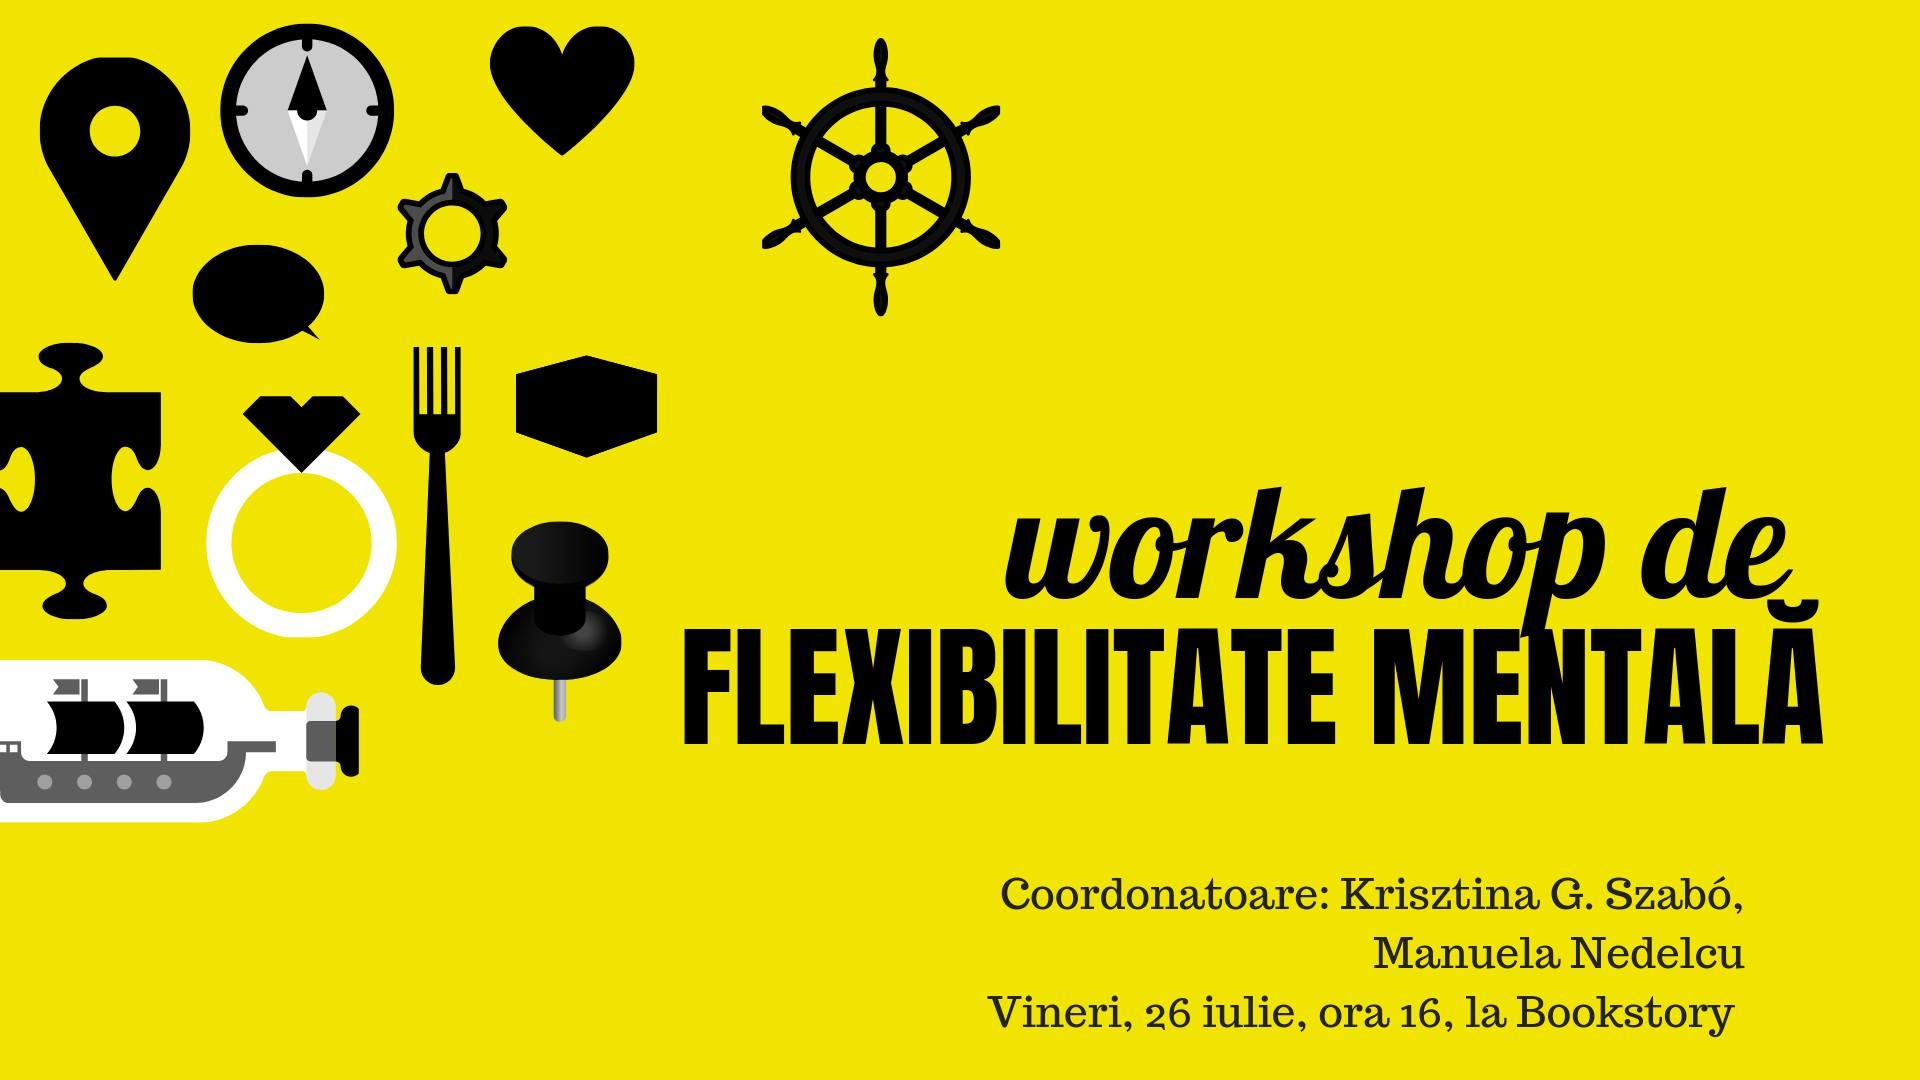 Workshop de flexibilitate mentală